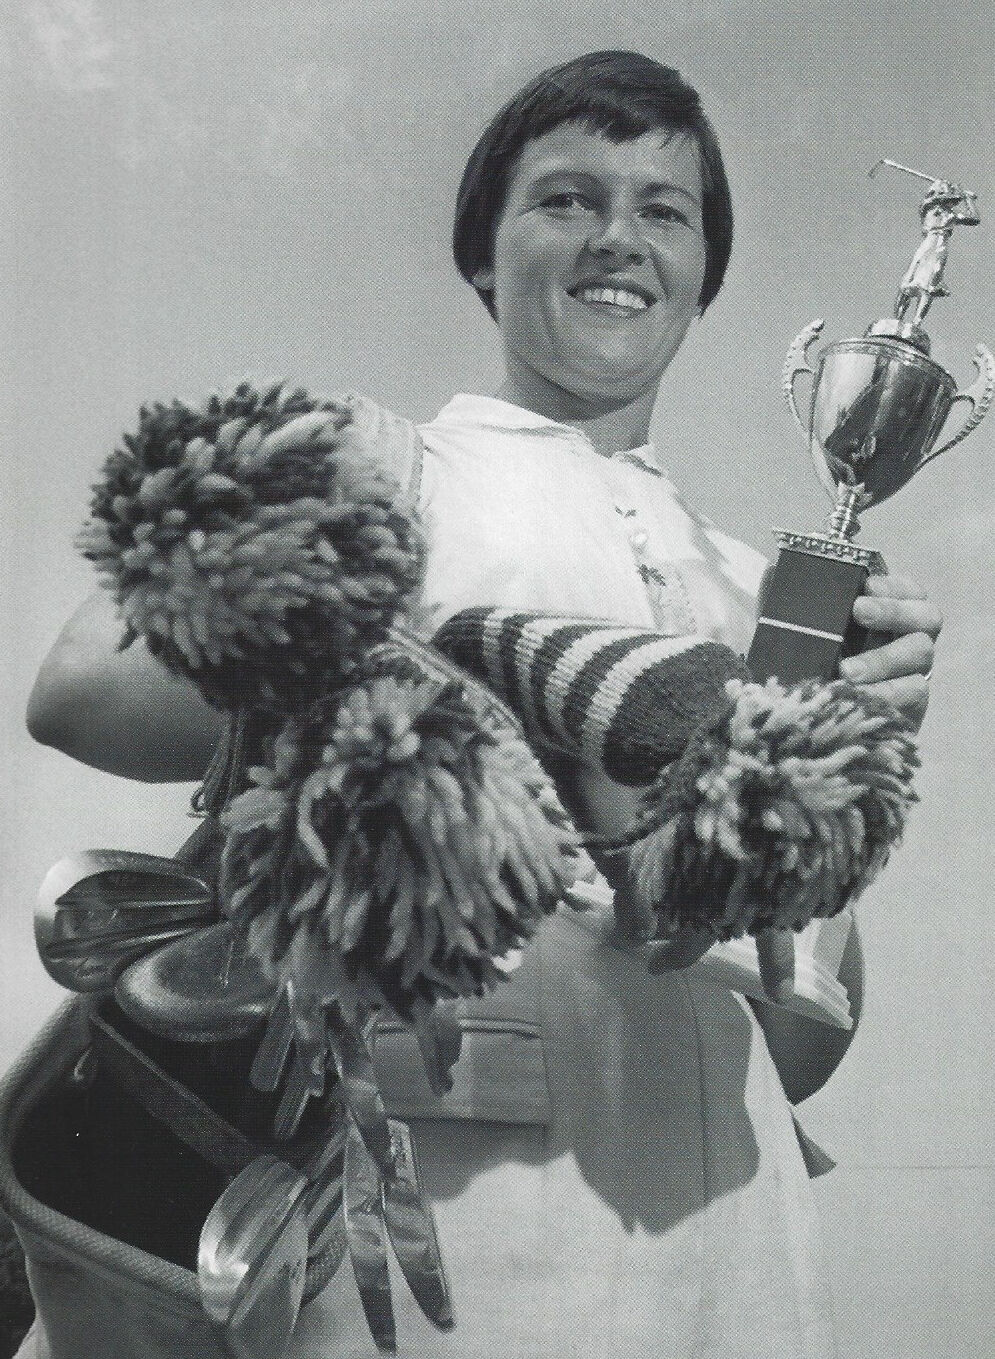 Mary McMillin Fossum, Green Bay native & former Michigan State women's golf coach